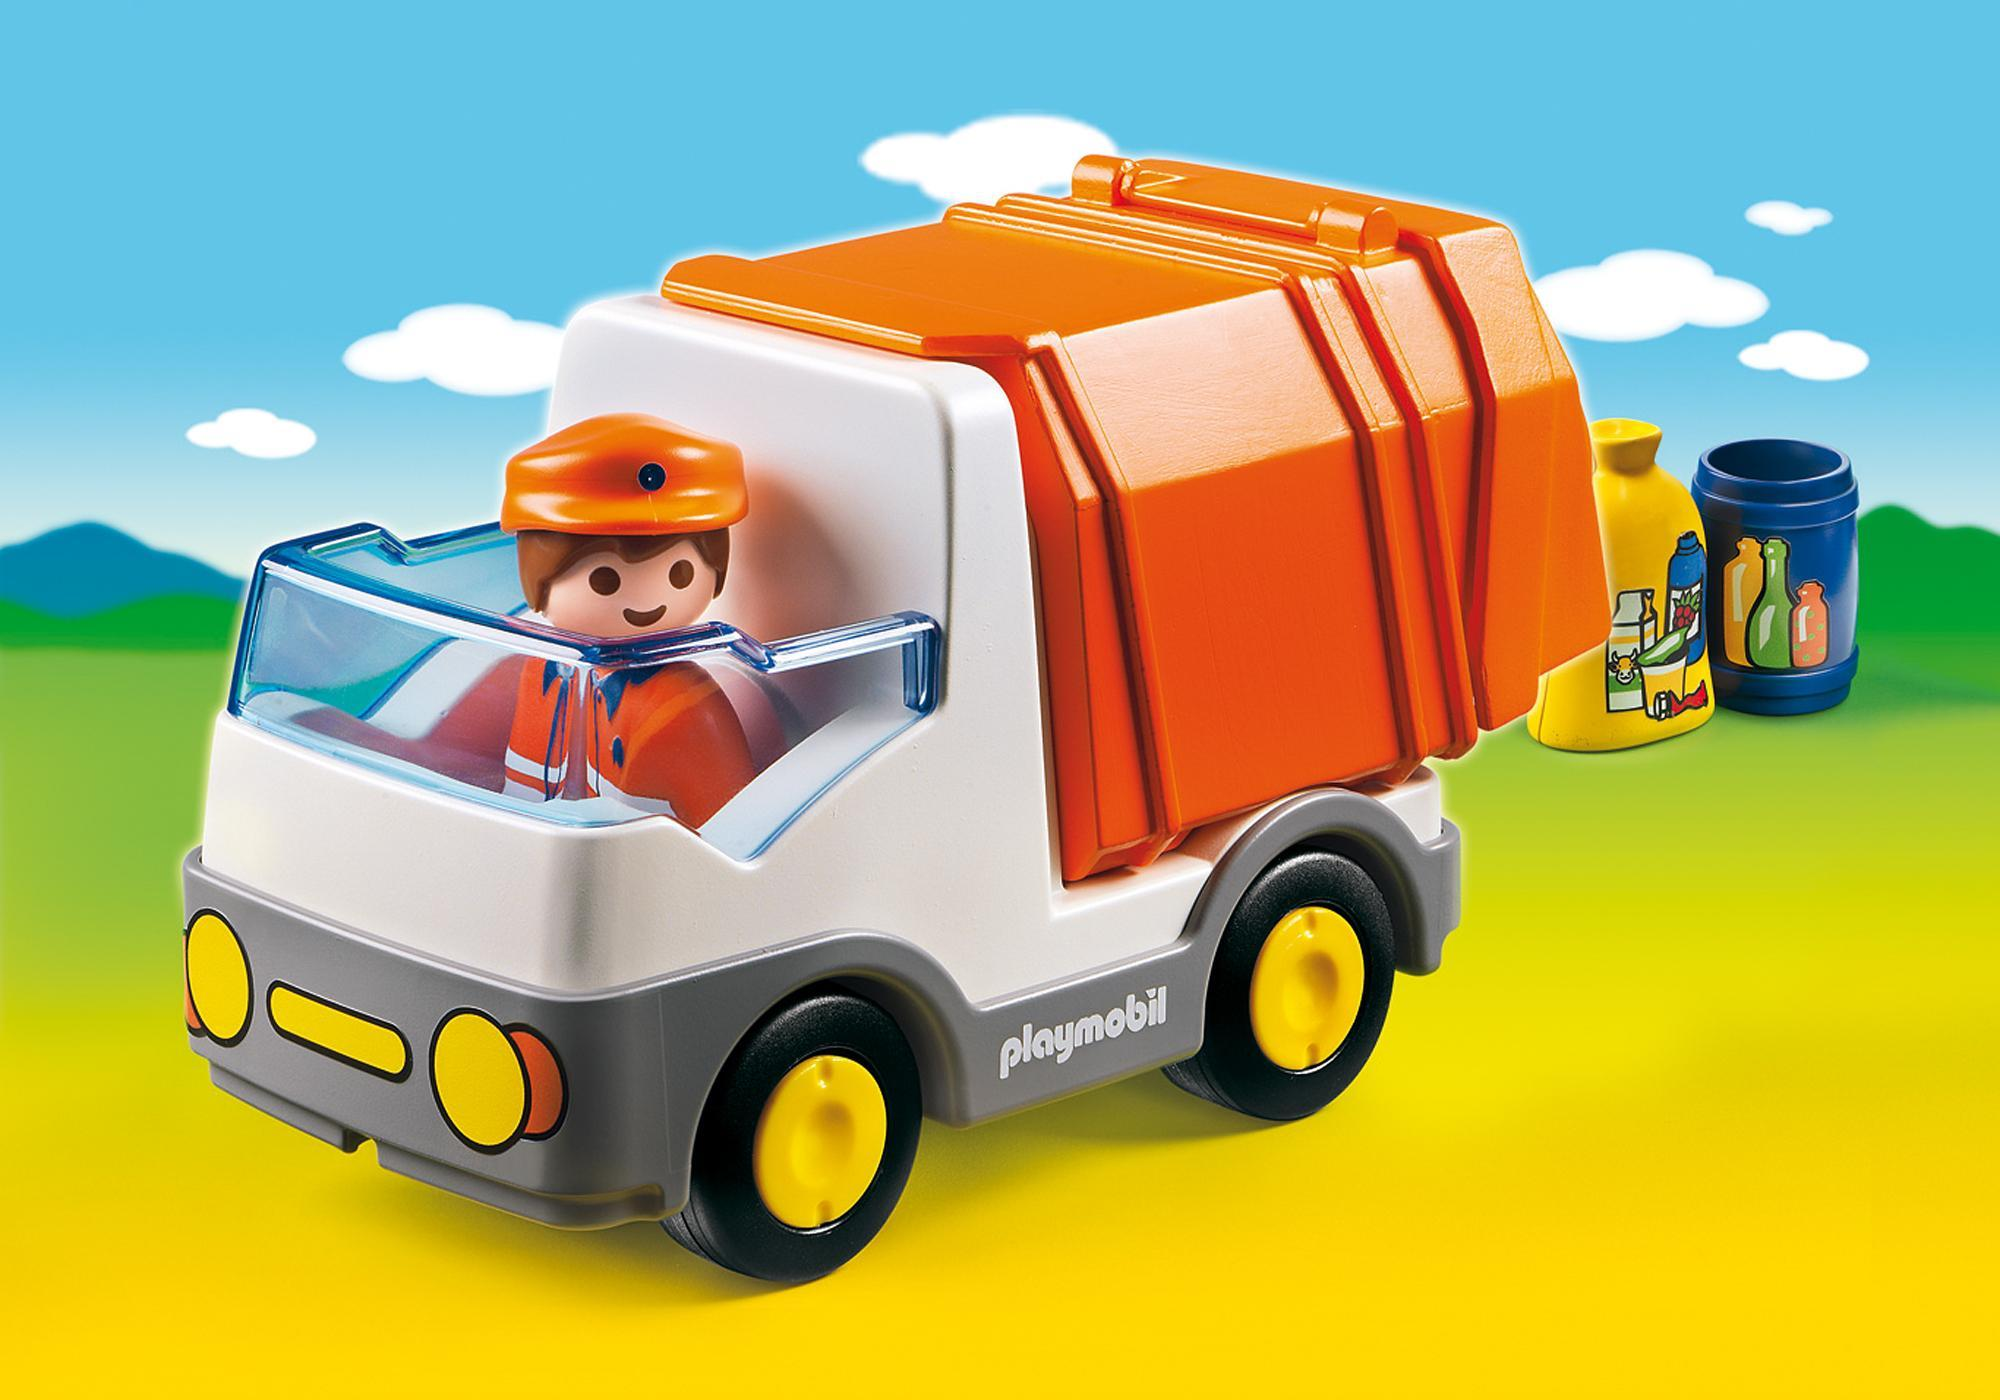 http://media.playmobil.com/i/playmobil/6774_product_detail/Müllauto